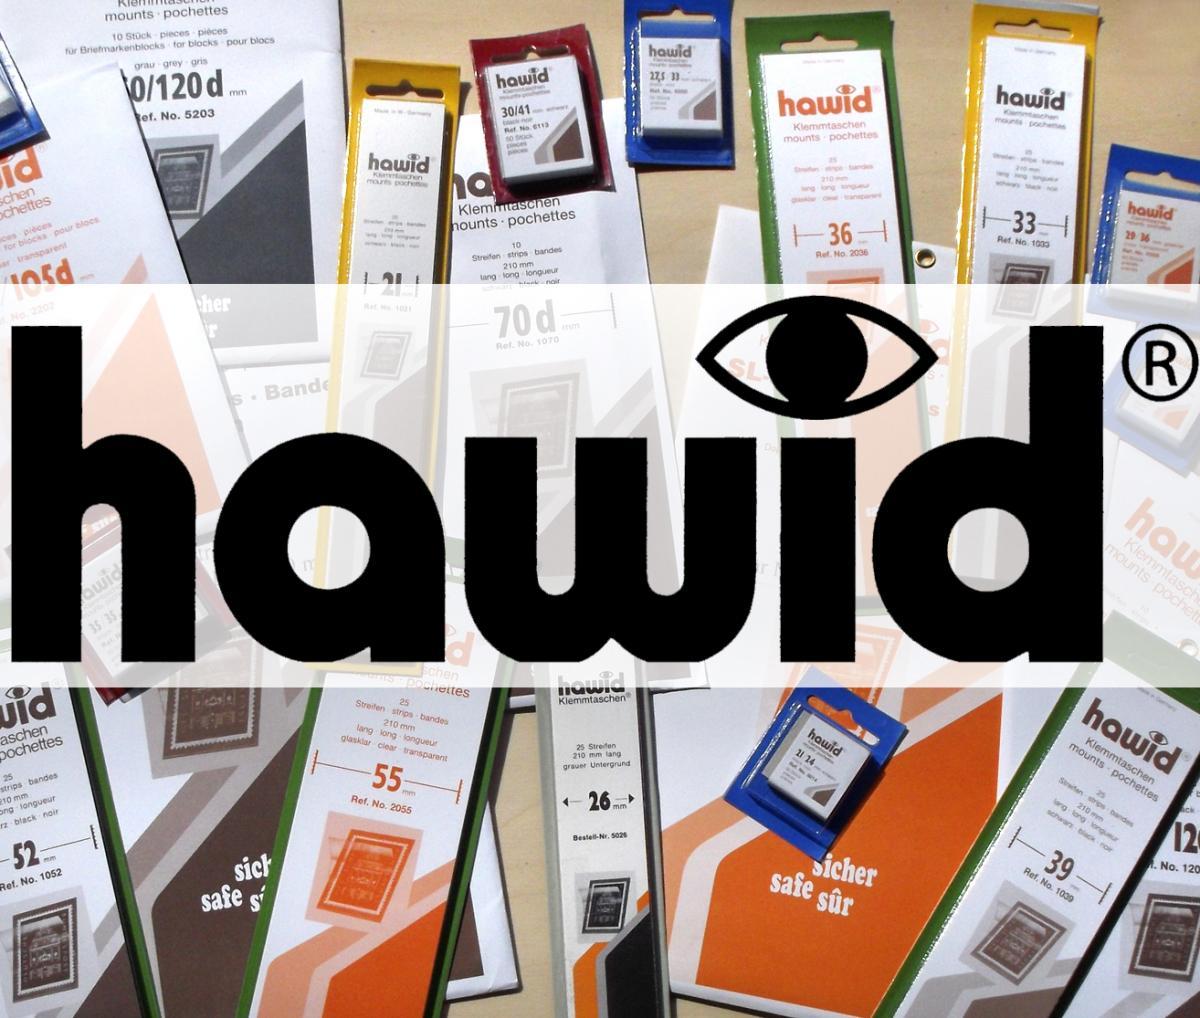 HAWID-Sonderblocks 1301, 100x60 mm, schwarz, 10 Stück 0